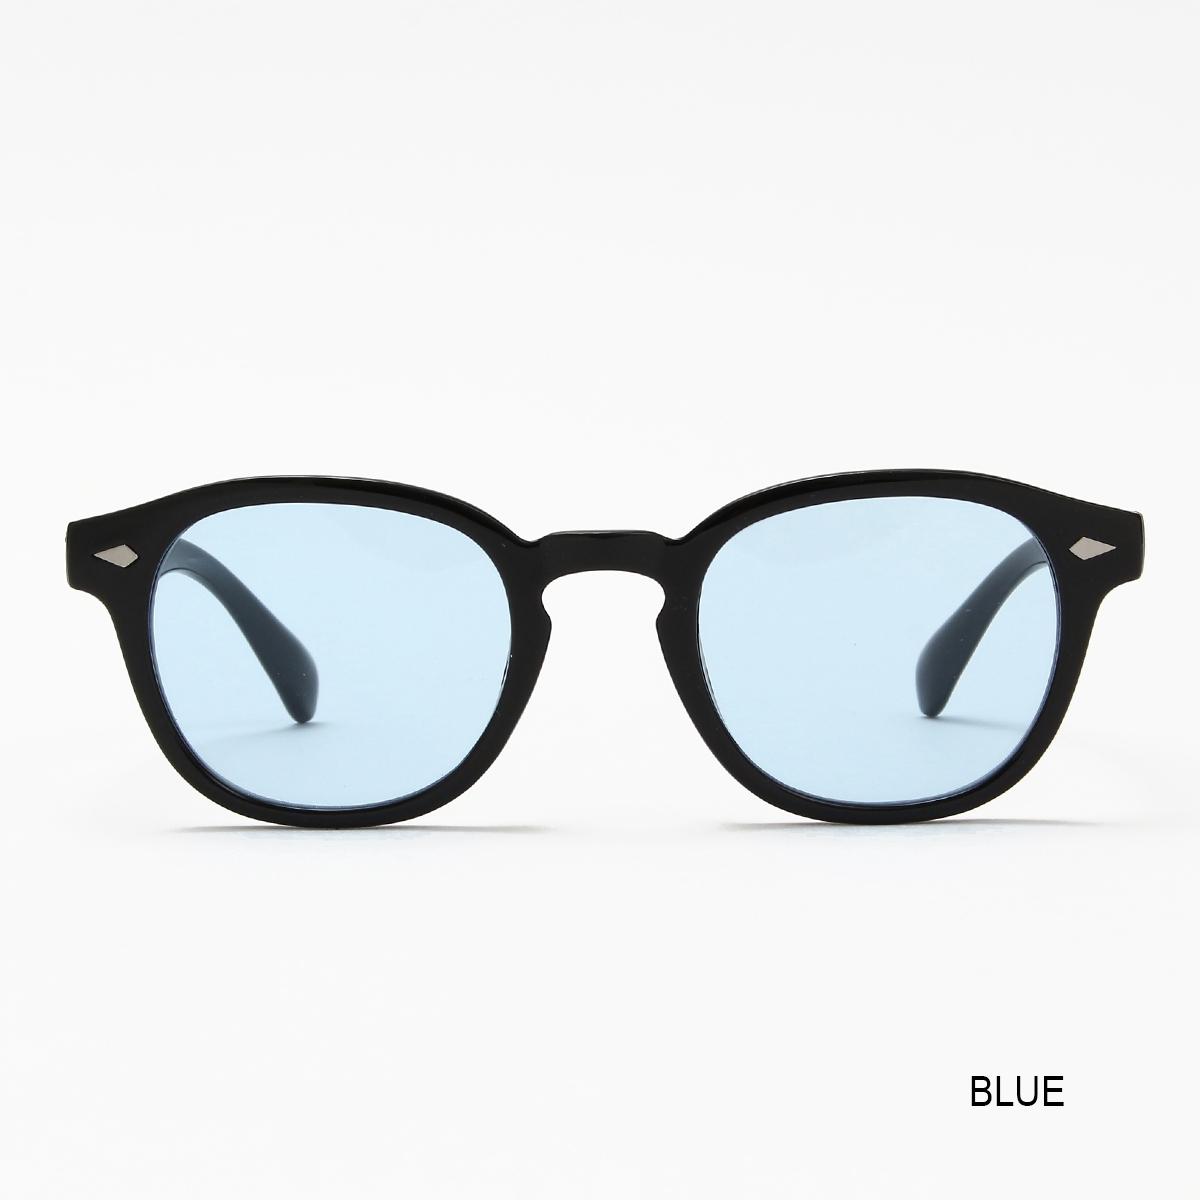 WELLINGTON-TYPE SUNGLASSES(BLACK&BLUE) TACS20SP05